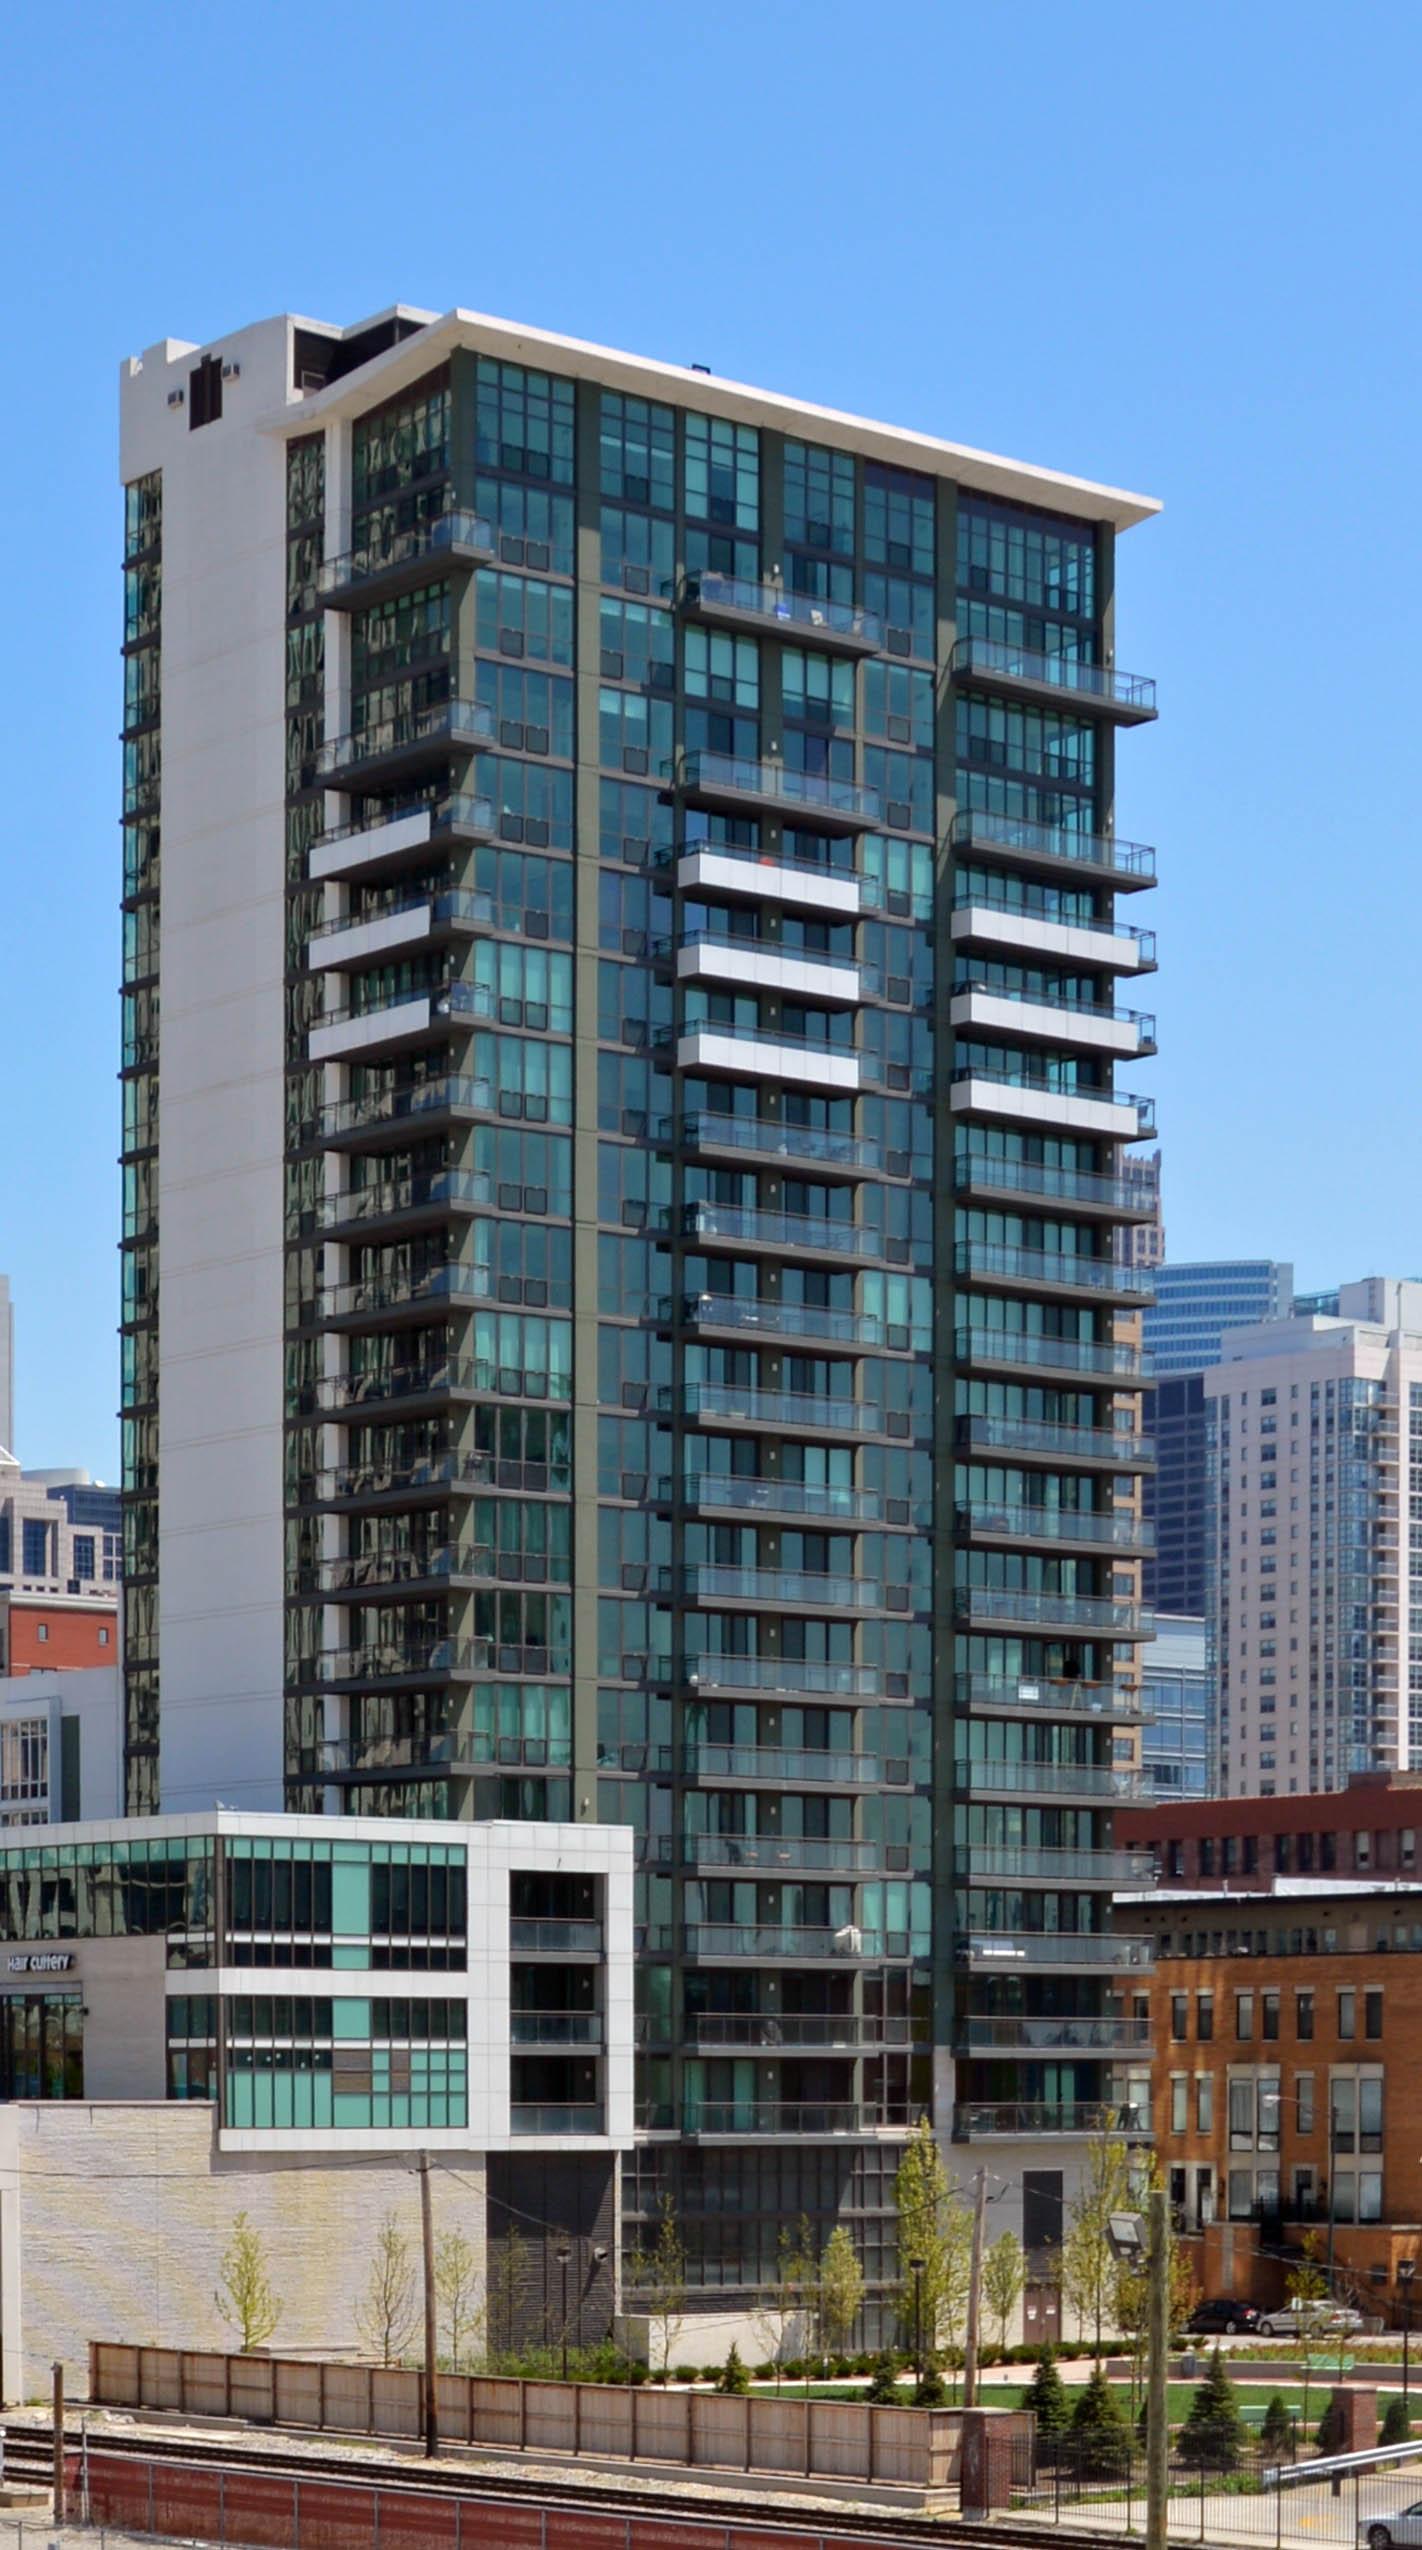 trio apartments 670 w wayman st fulton river district. Black Bedroom Furniture Sets. Home Design Ideas